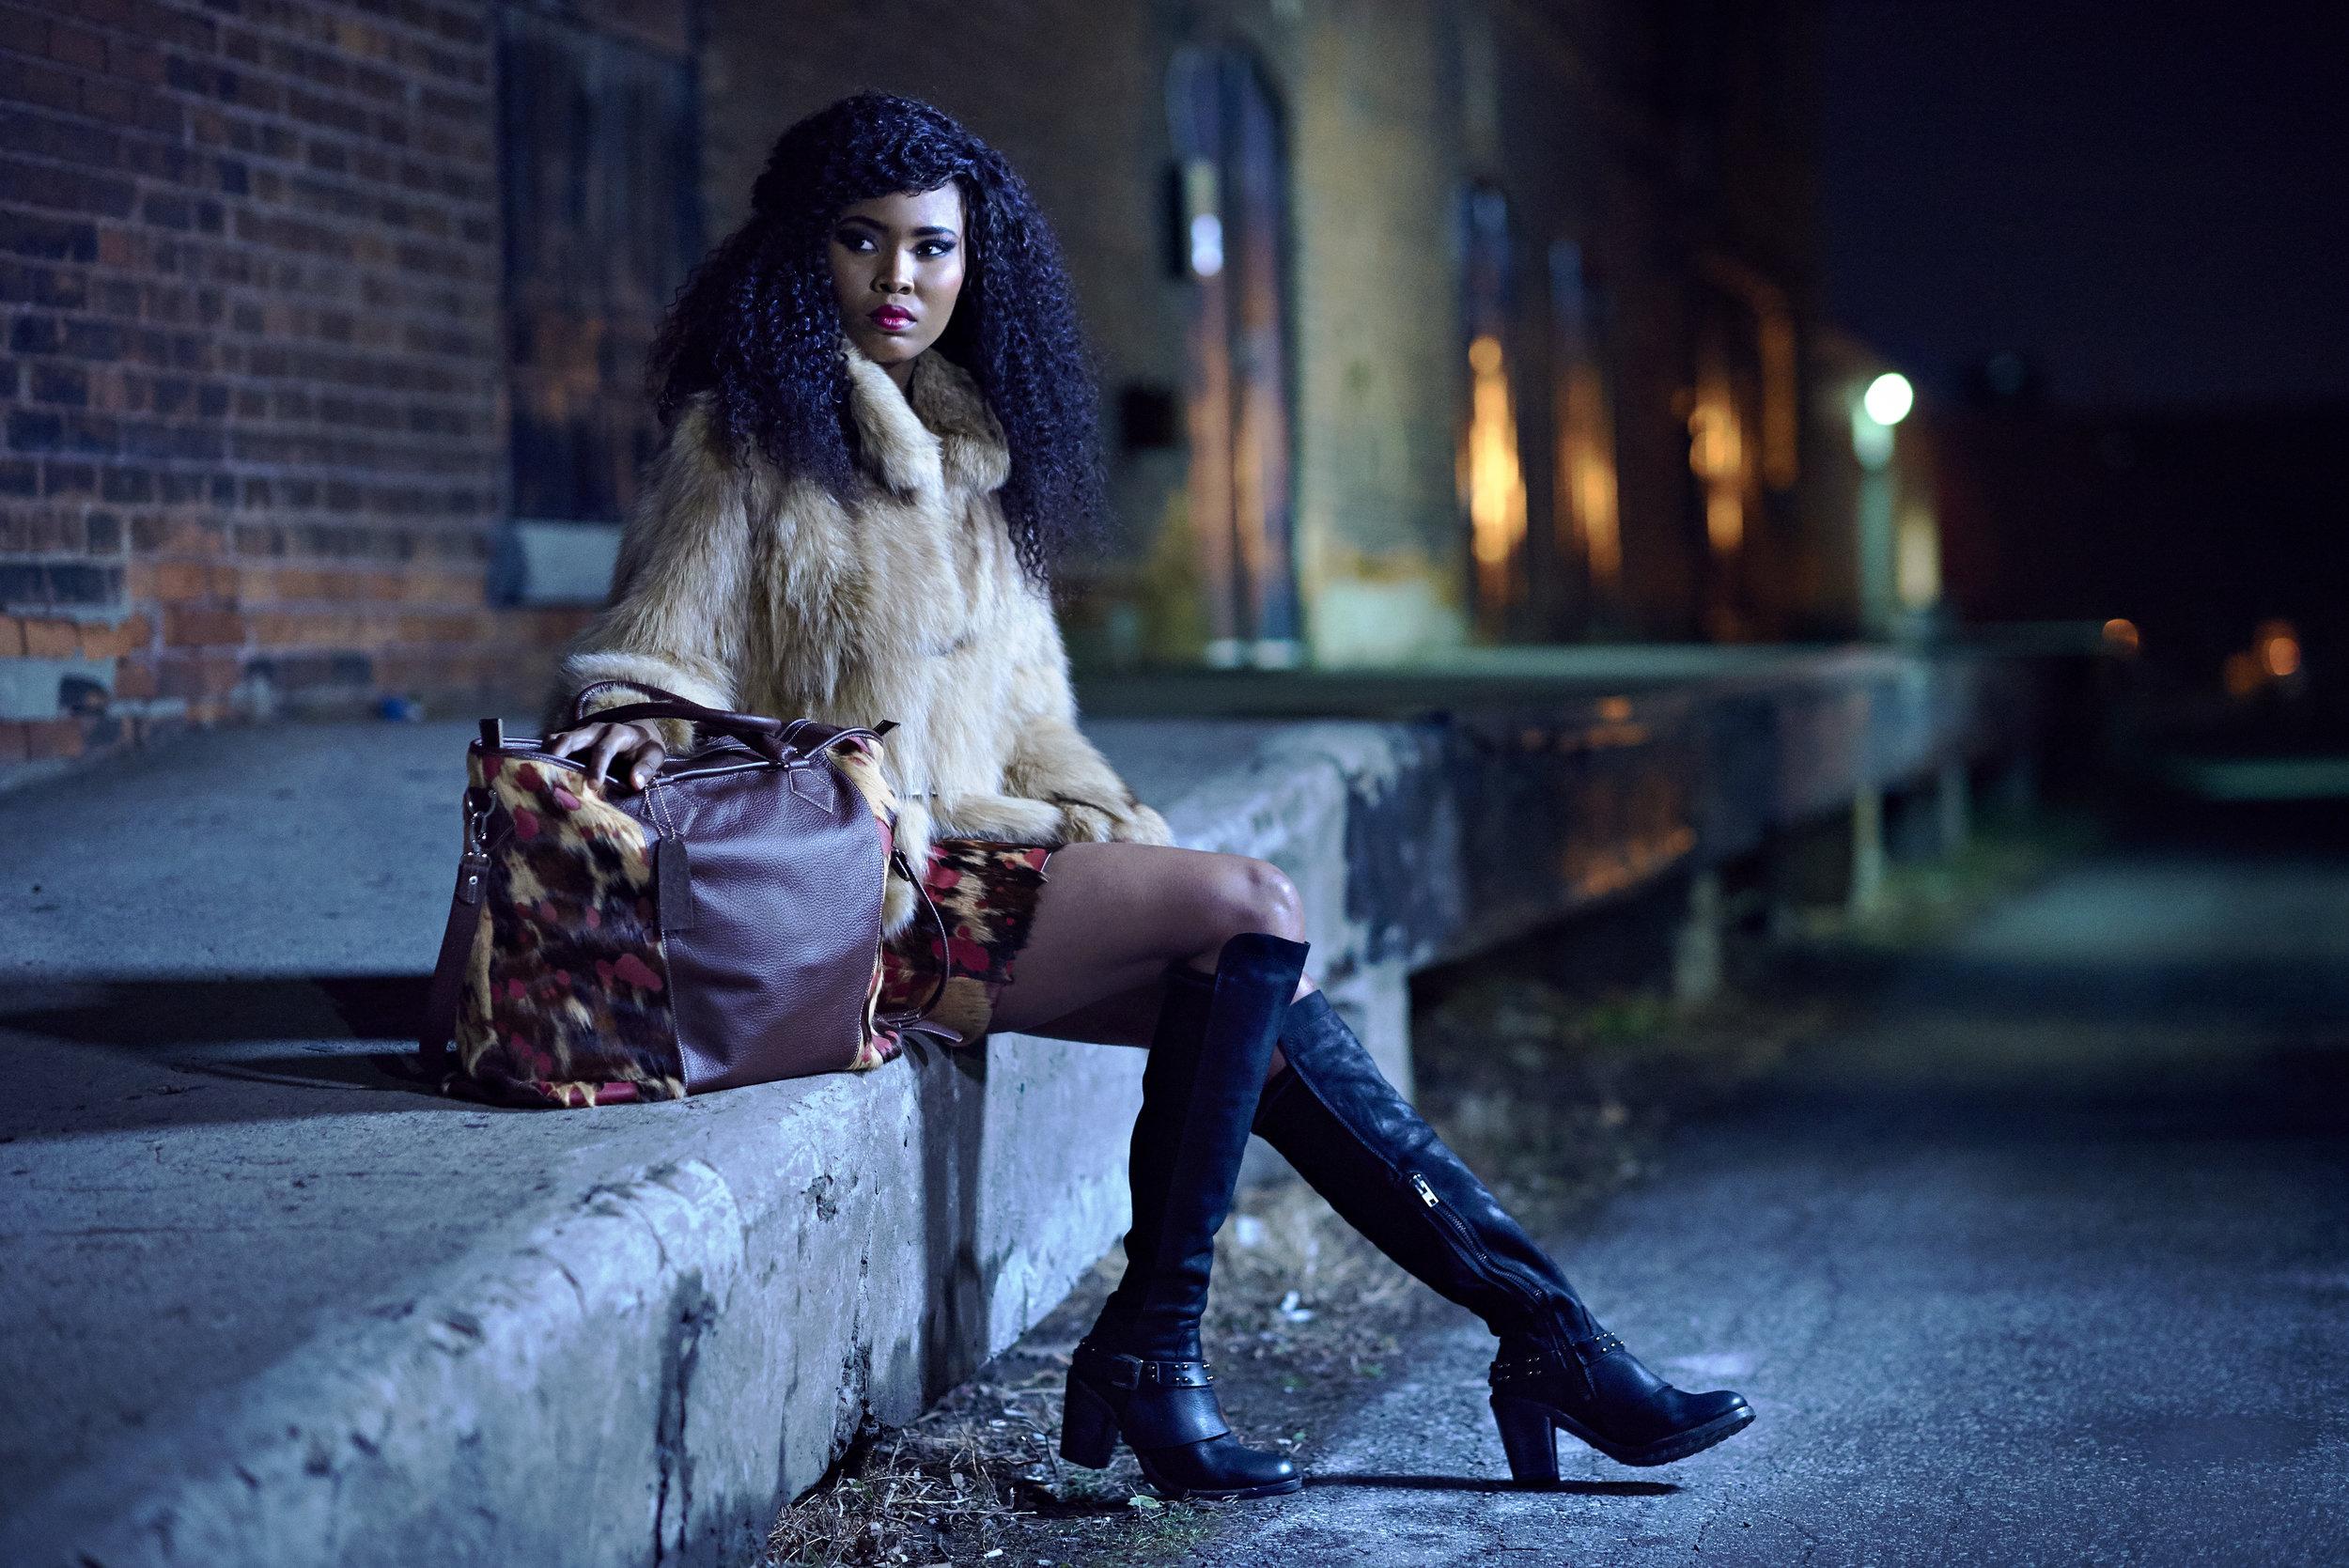 Marta-Hewson-Fashion-urbanicity-Magazine-1614.jpg